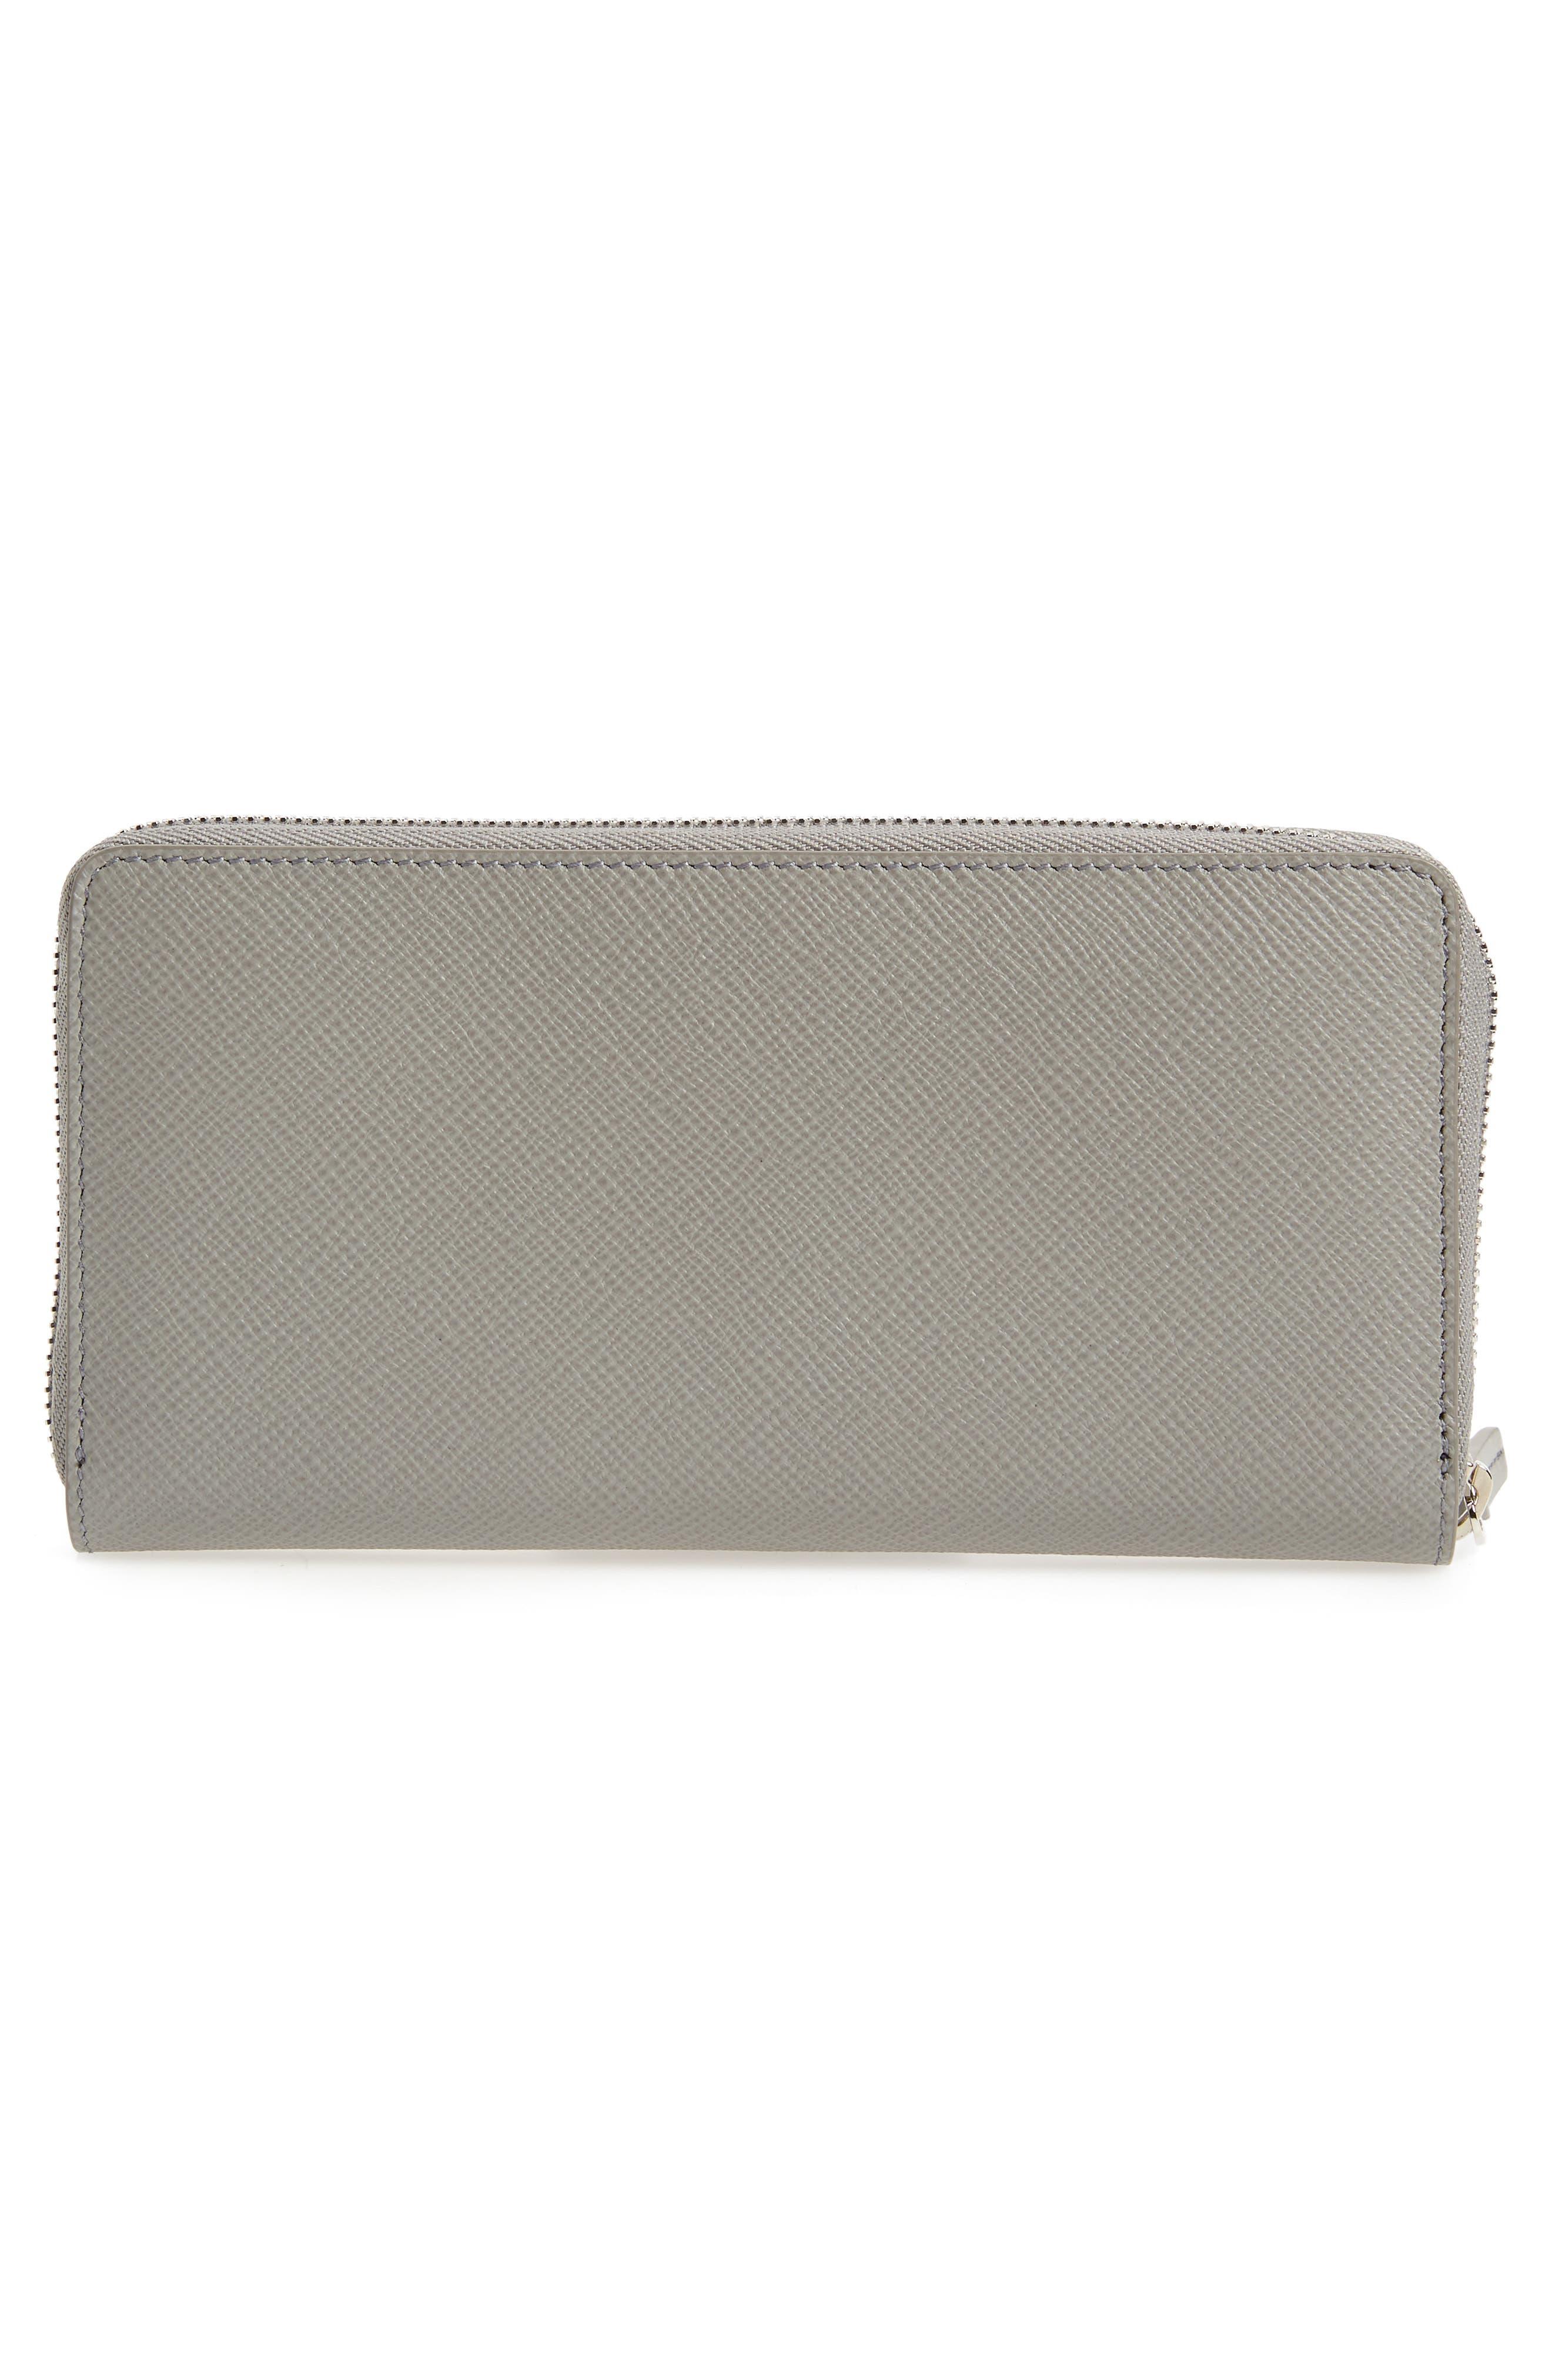 Large Panama Zip Around Wallet,                             Alternate thumbnail 3, color,                             020